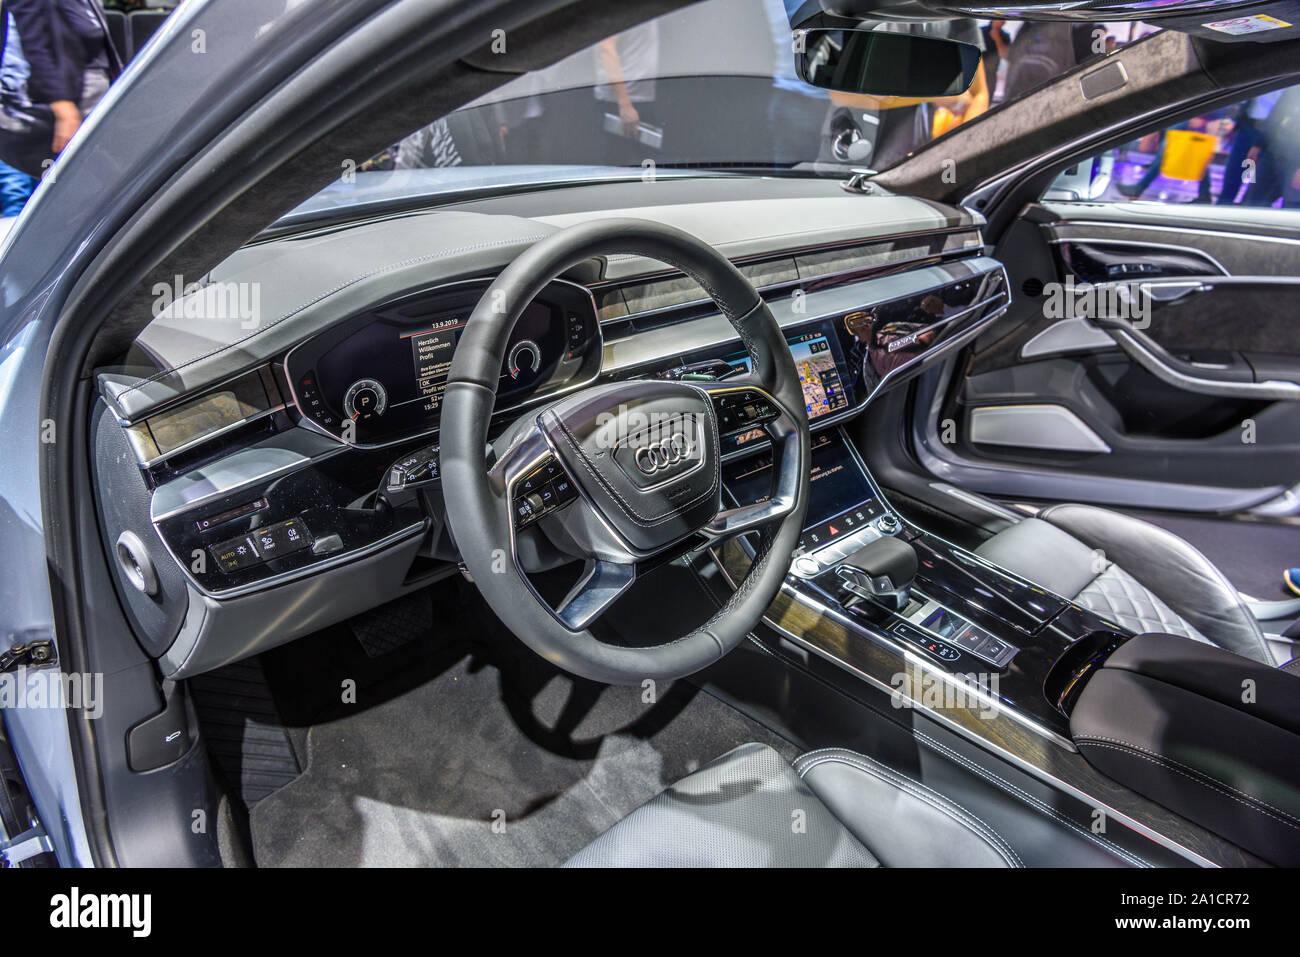 Kekurangan Audi 18 Tangguh